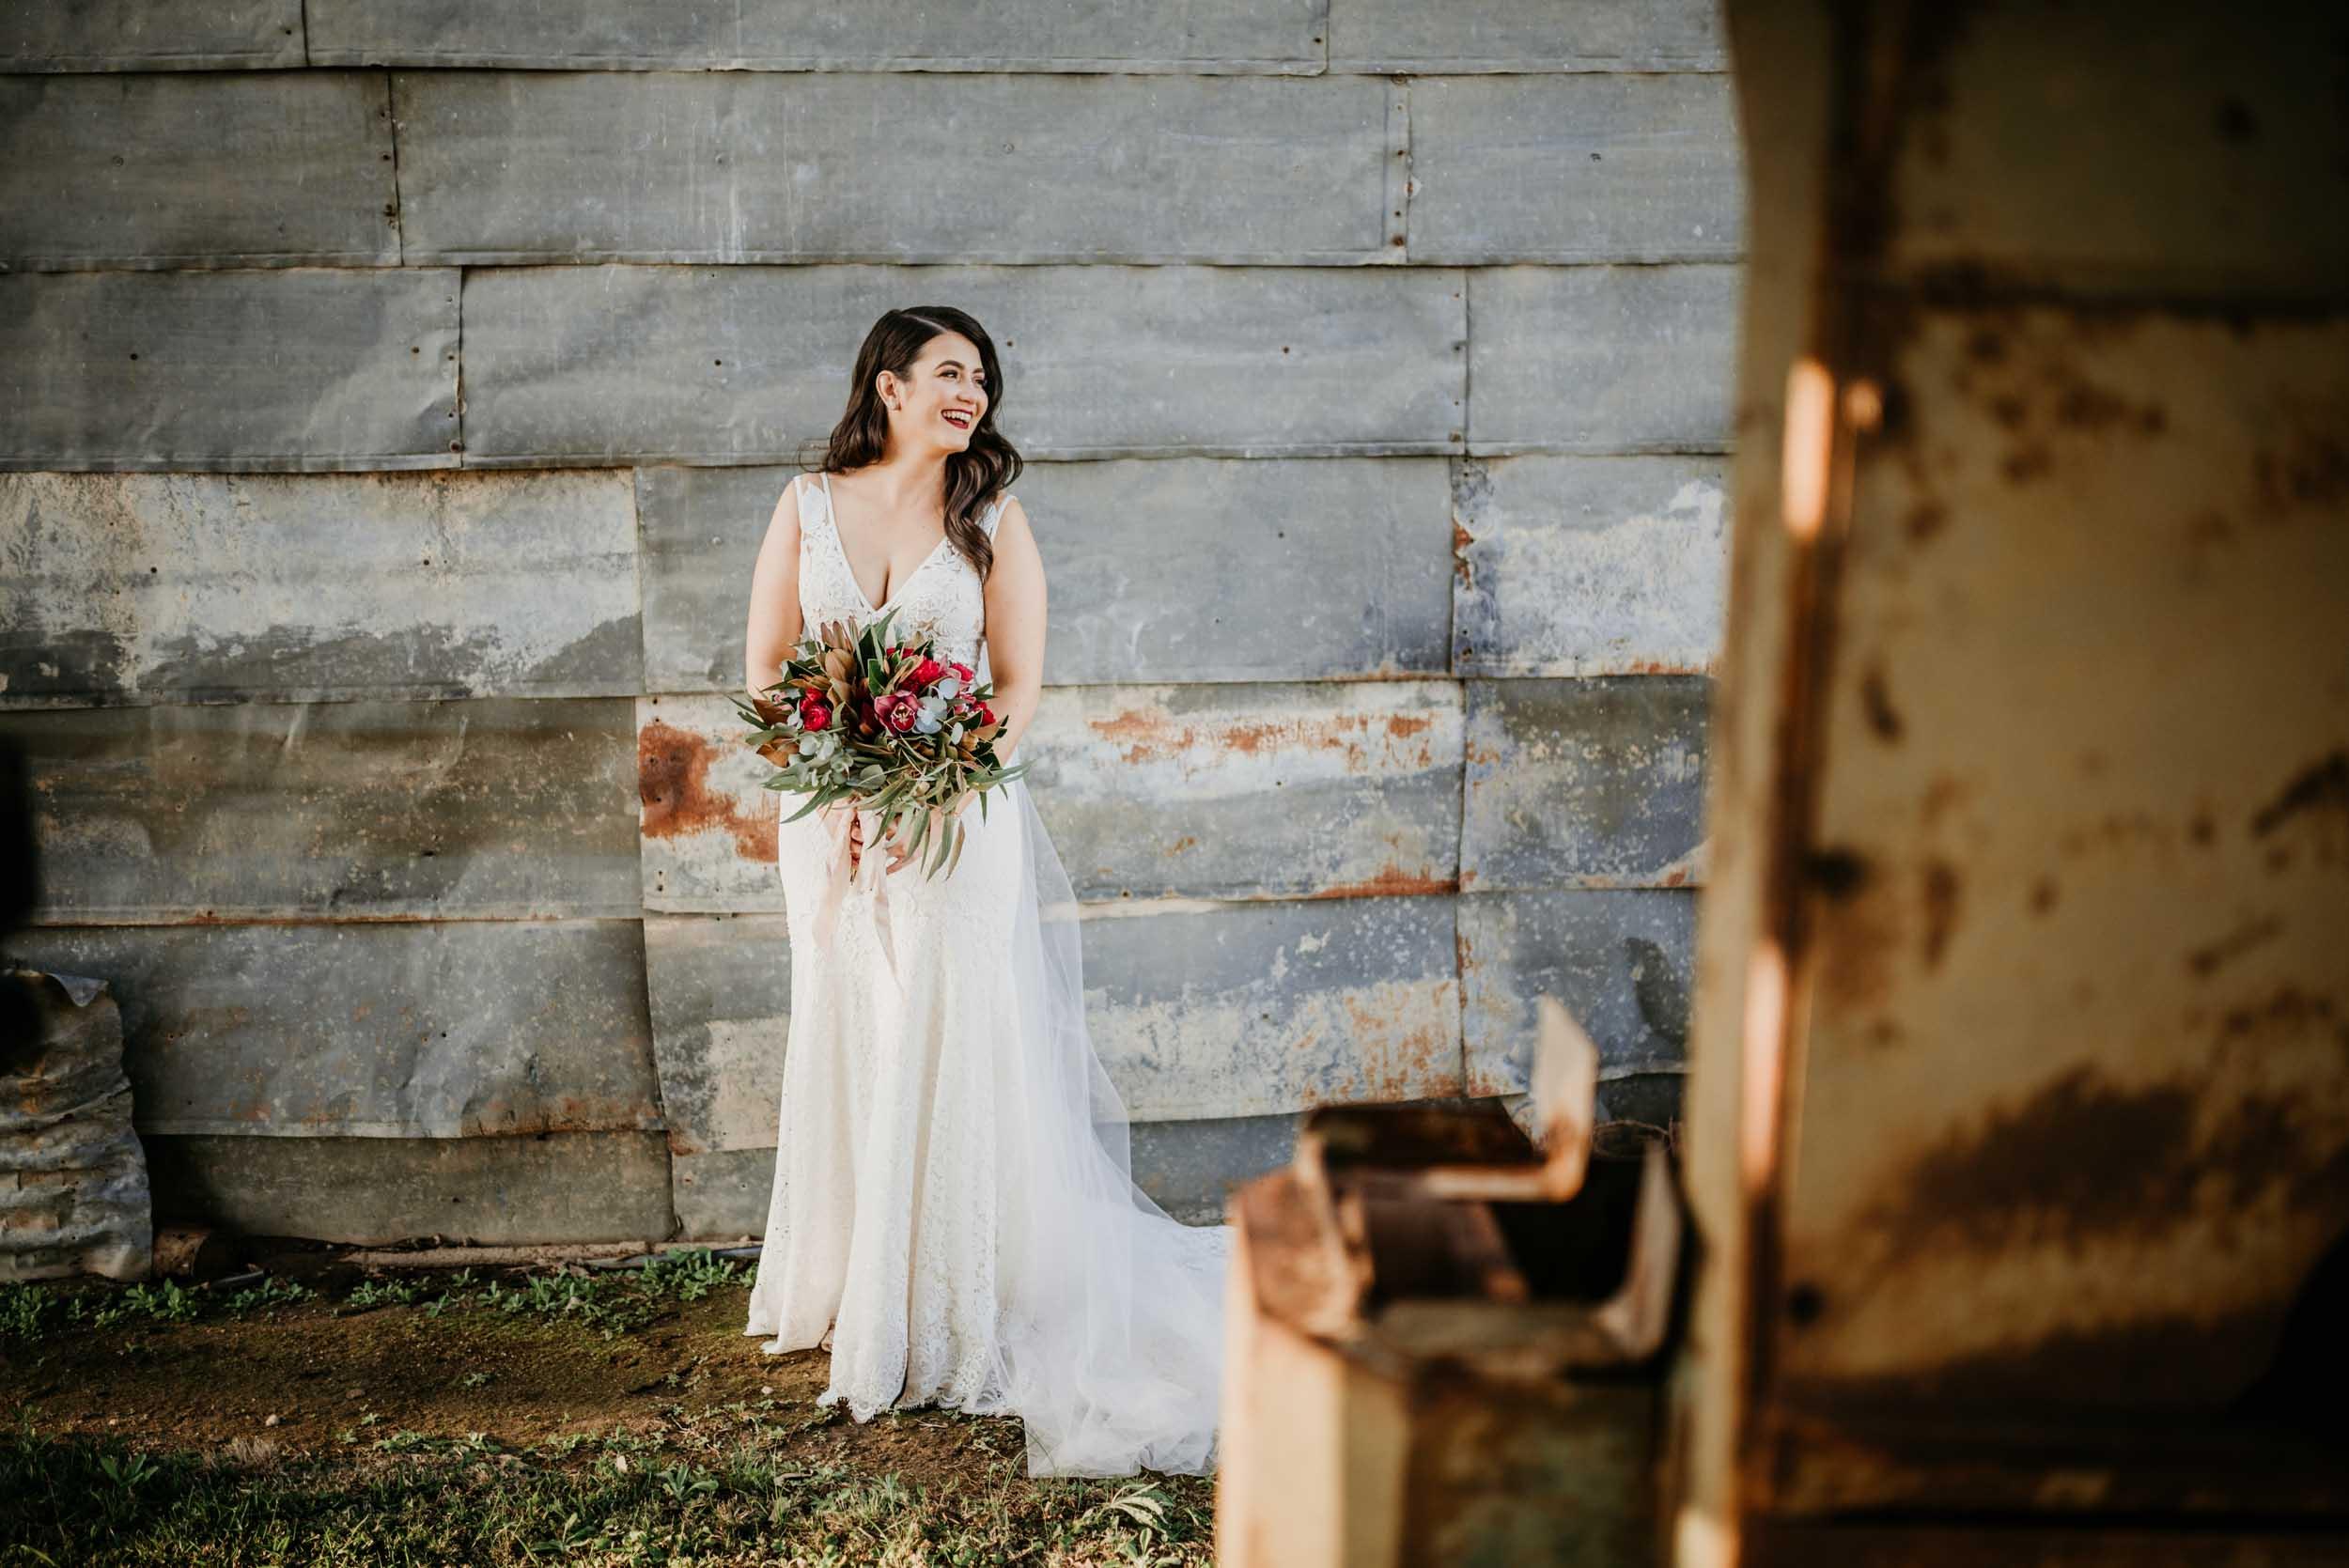 The Raw Photographer - Cairns Wedding Photographer - Atherton Tablelands - Mareeba farm Wedding - Irene Costa's Devine Bridal - Candid - Photo Package-40.jpg